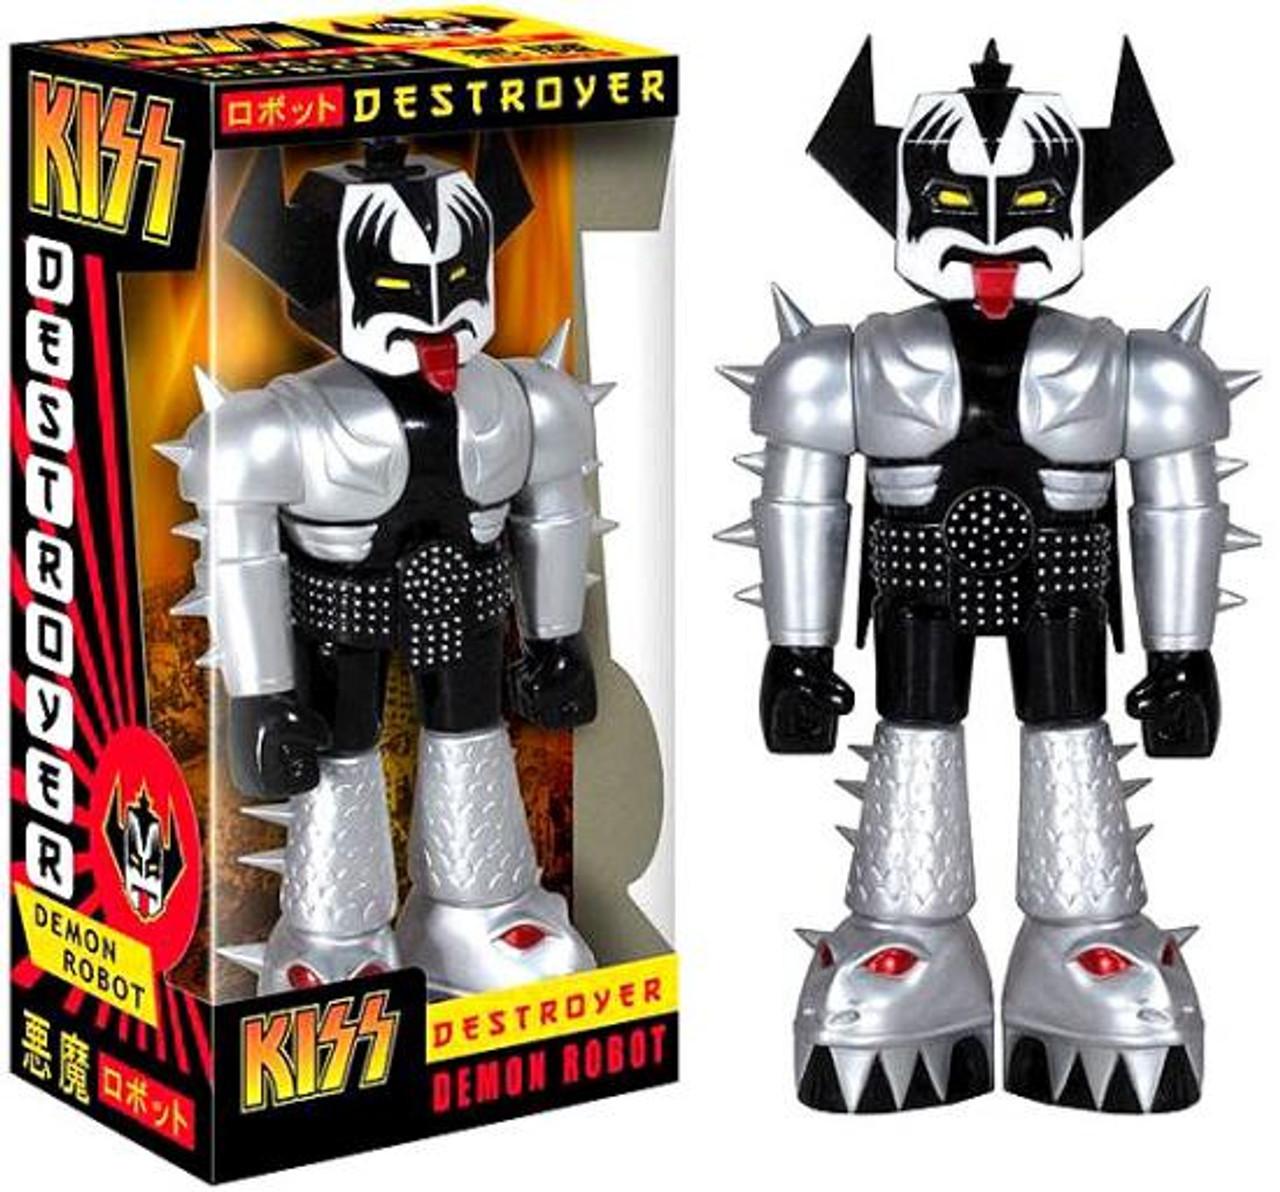 Funko KISS Destroyer Demon Robot 11-Inch Vinyl Figure